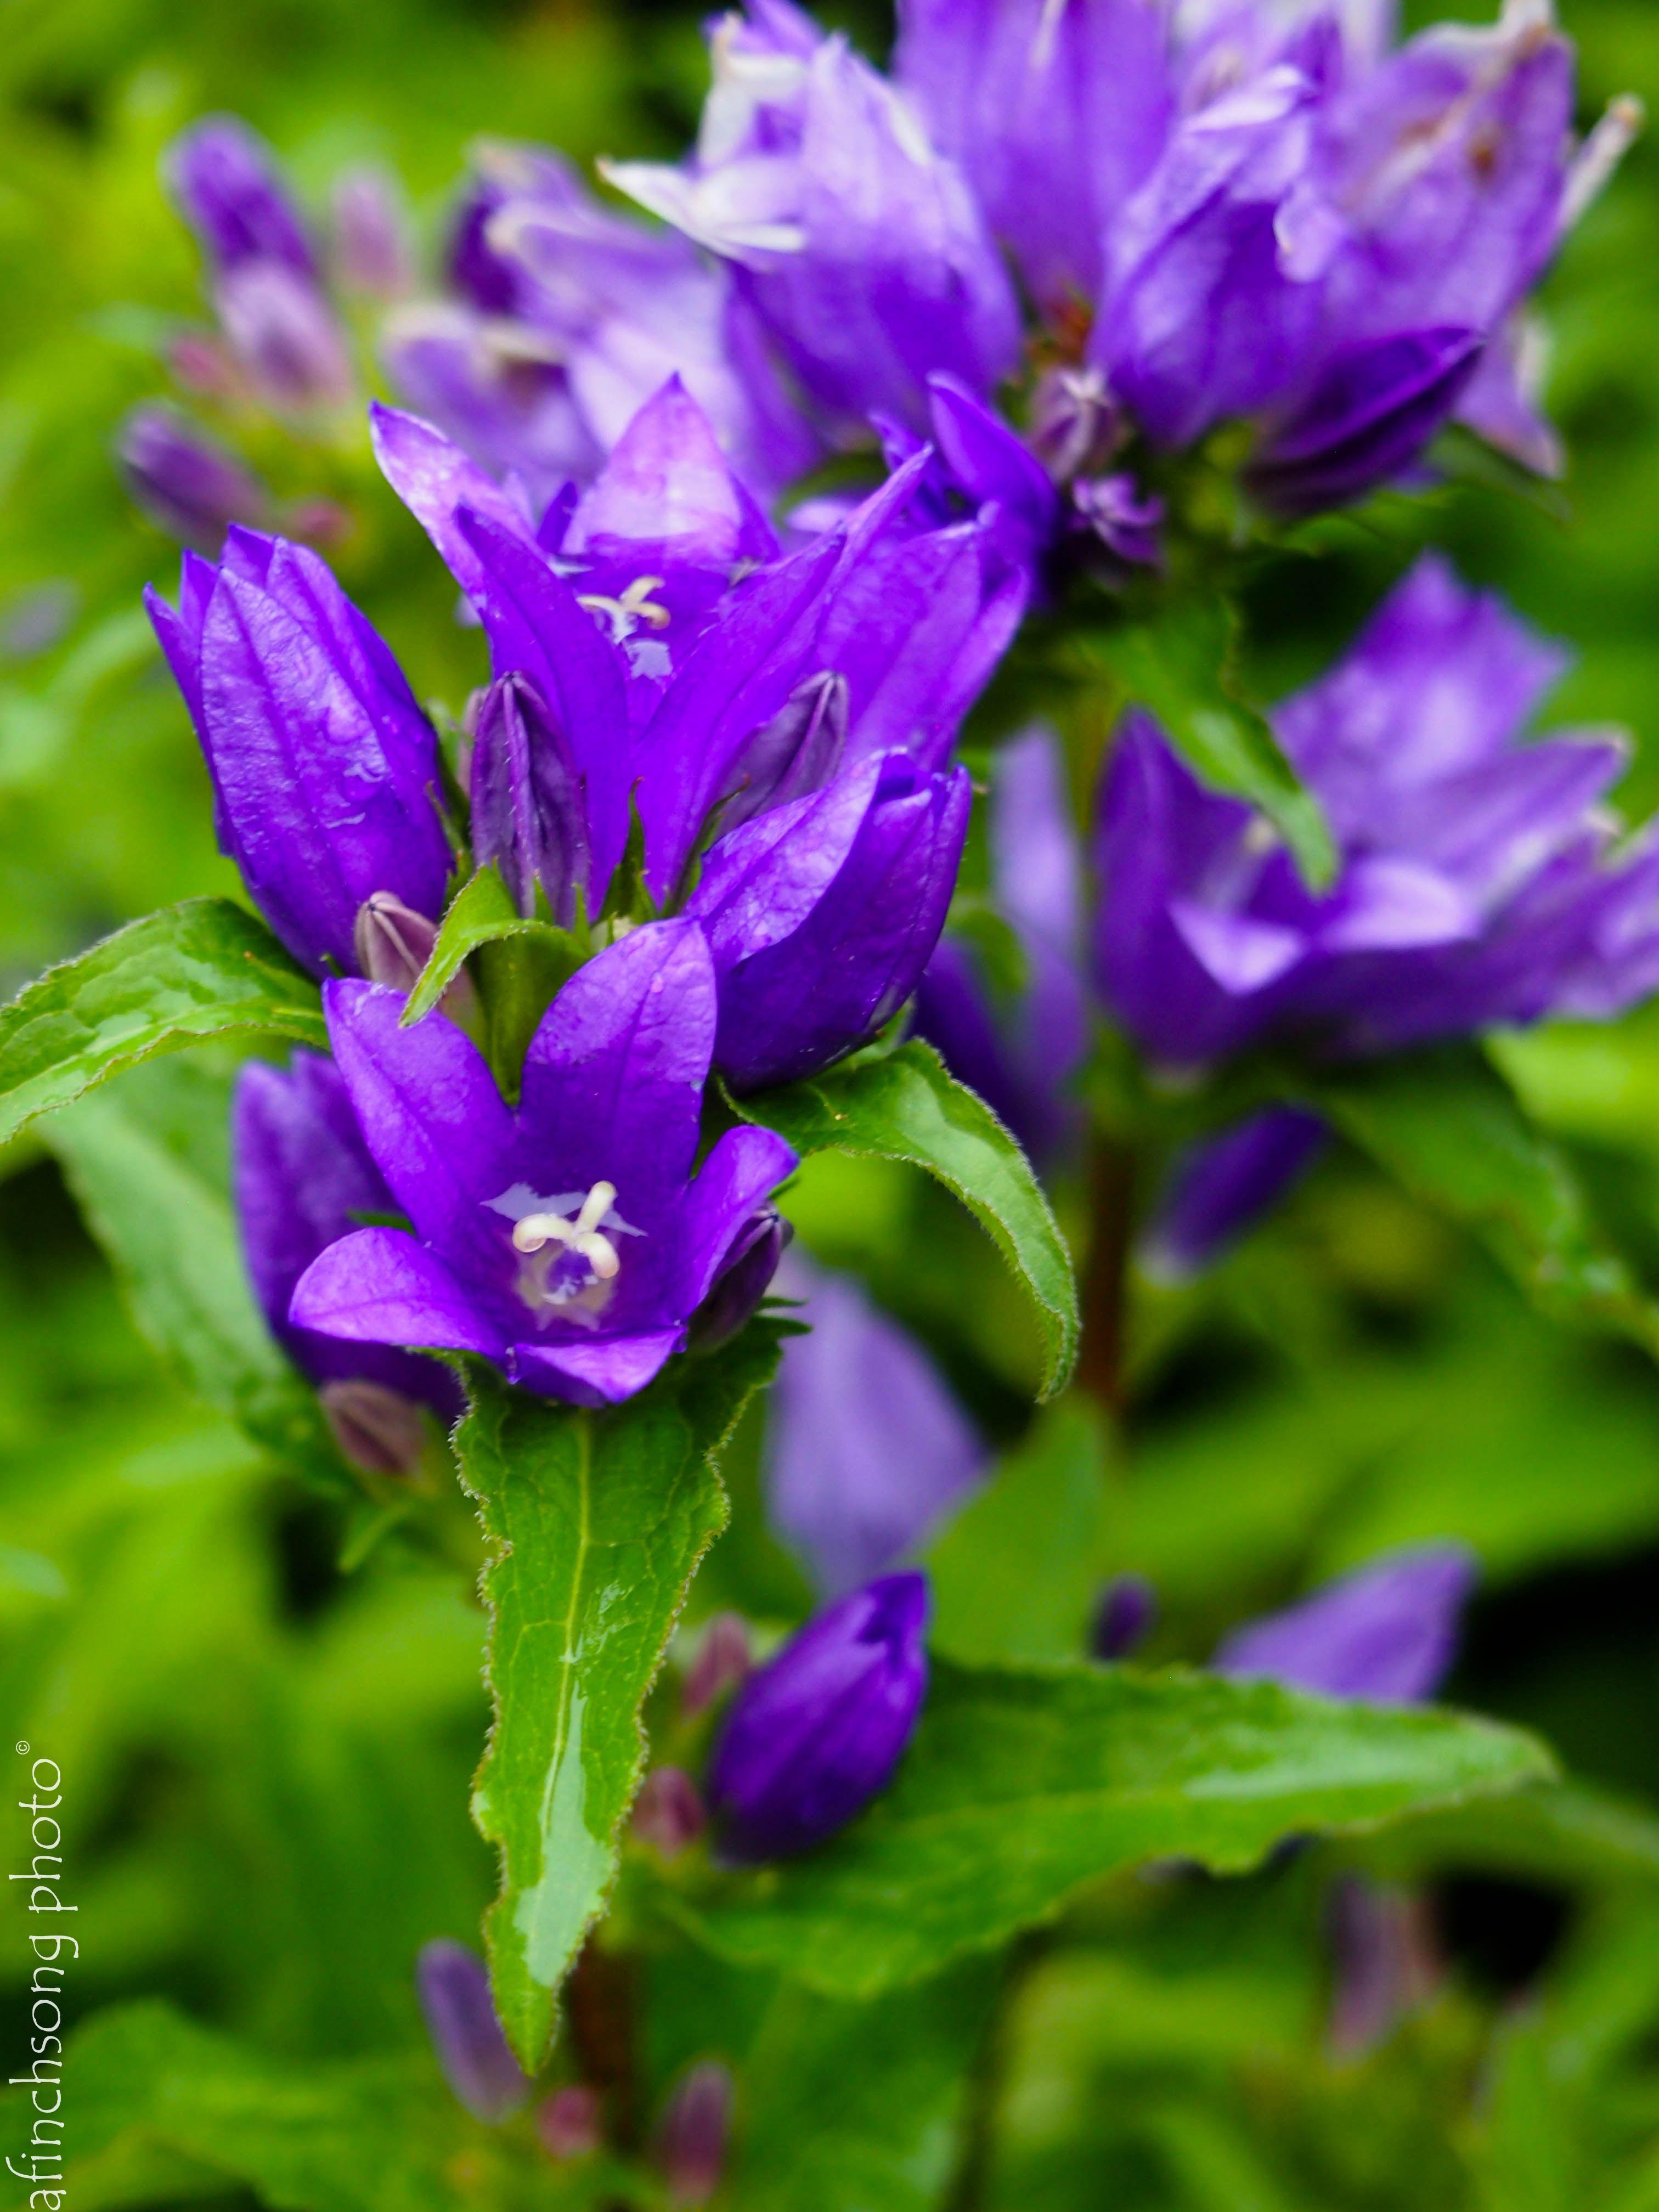 Perennial campanula glomerata bellefleur blue perennials perennial campanula glomerata bellefleur blue izmirmasajfo